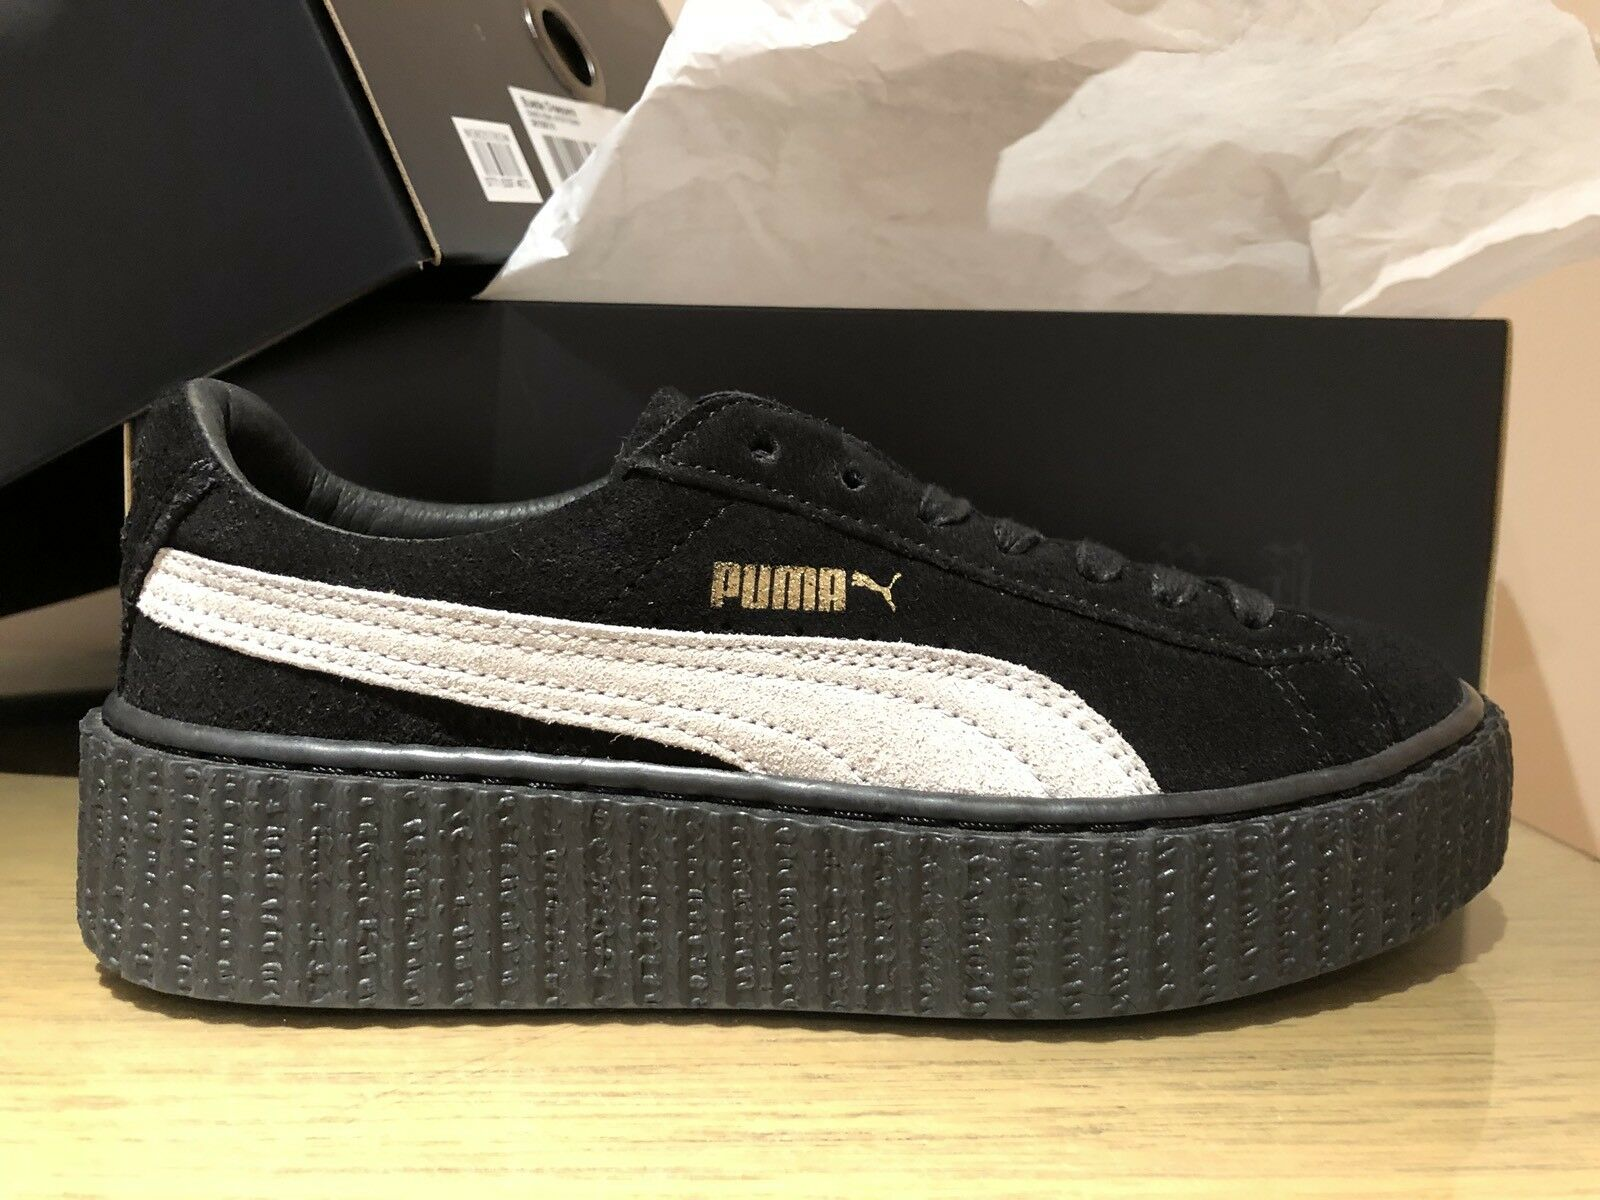 Puma x Fenty Rihanna Creepers US6